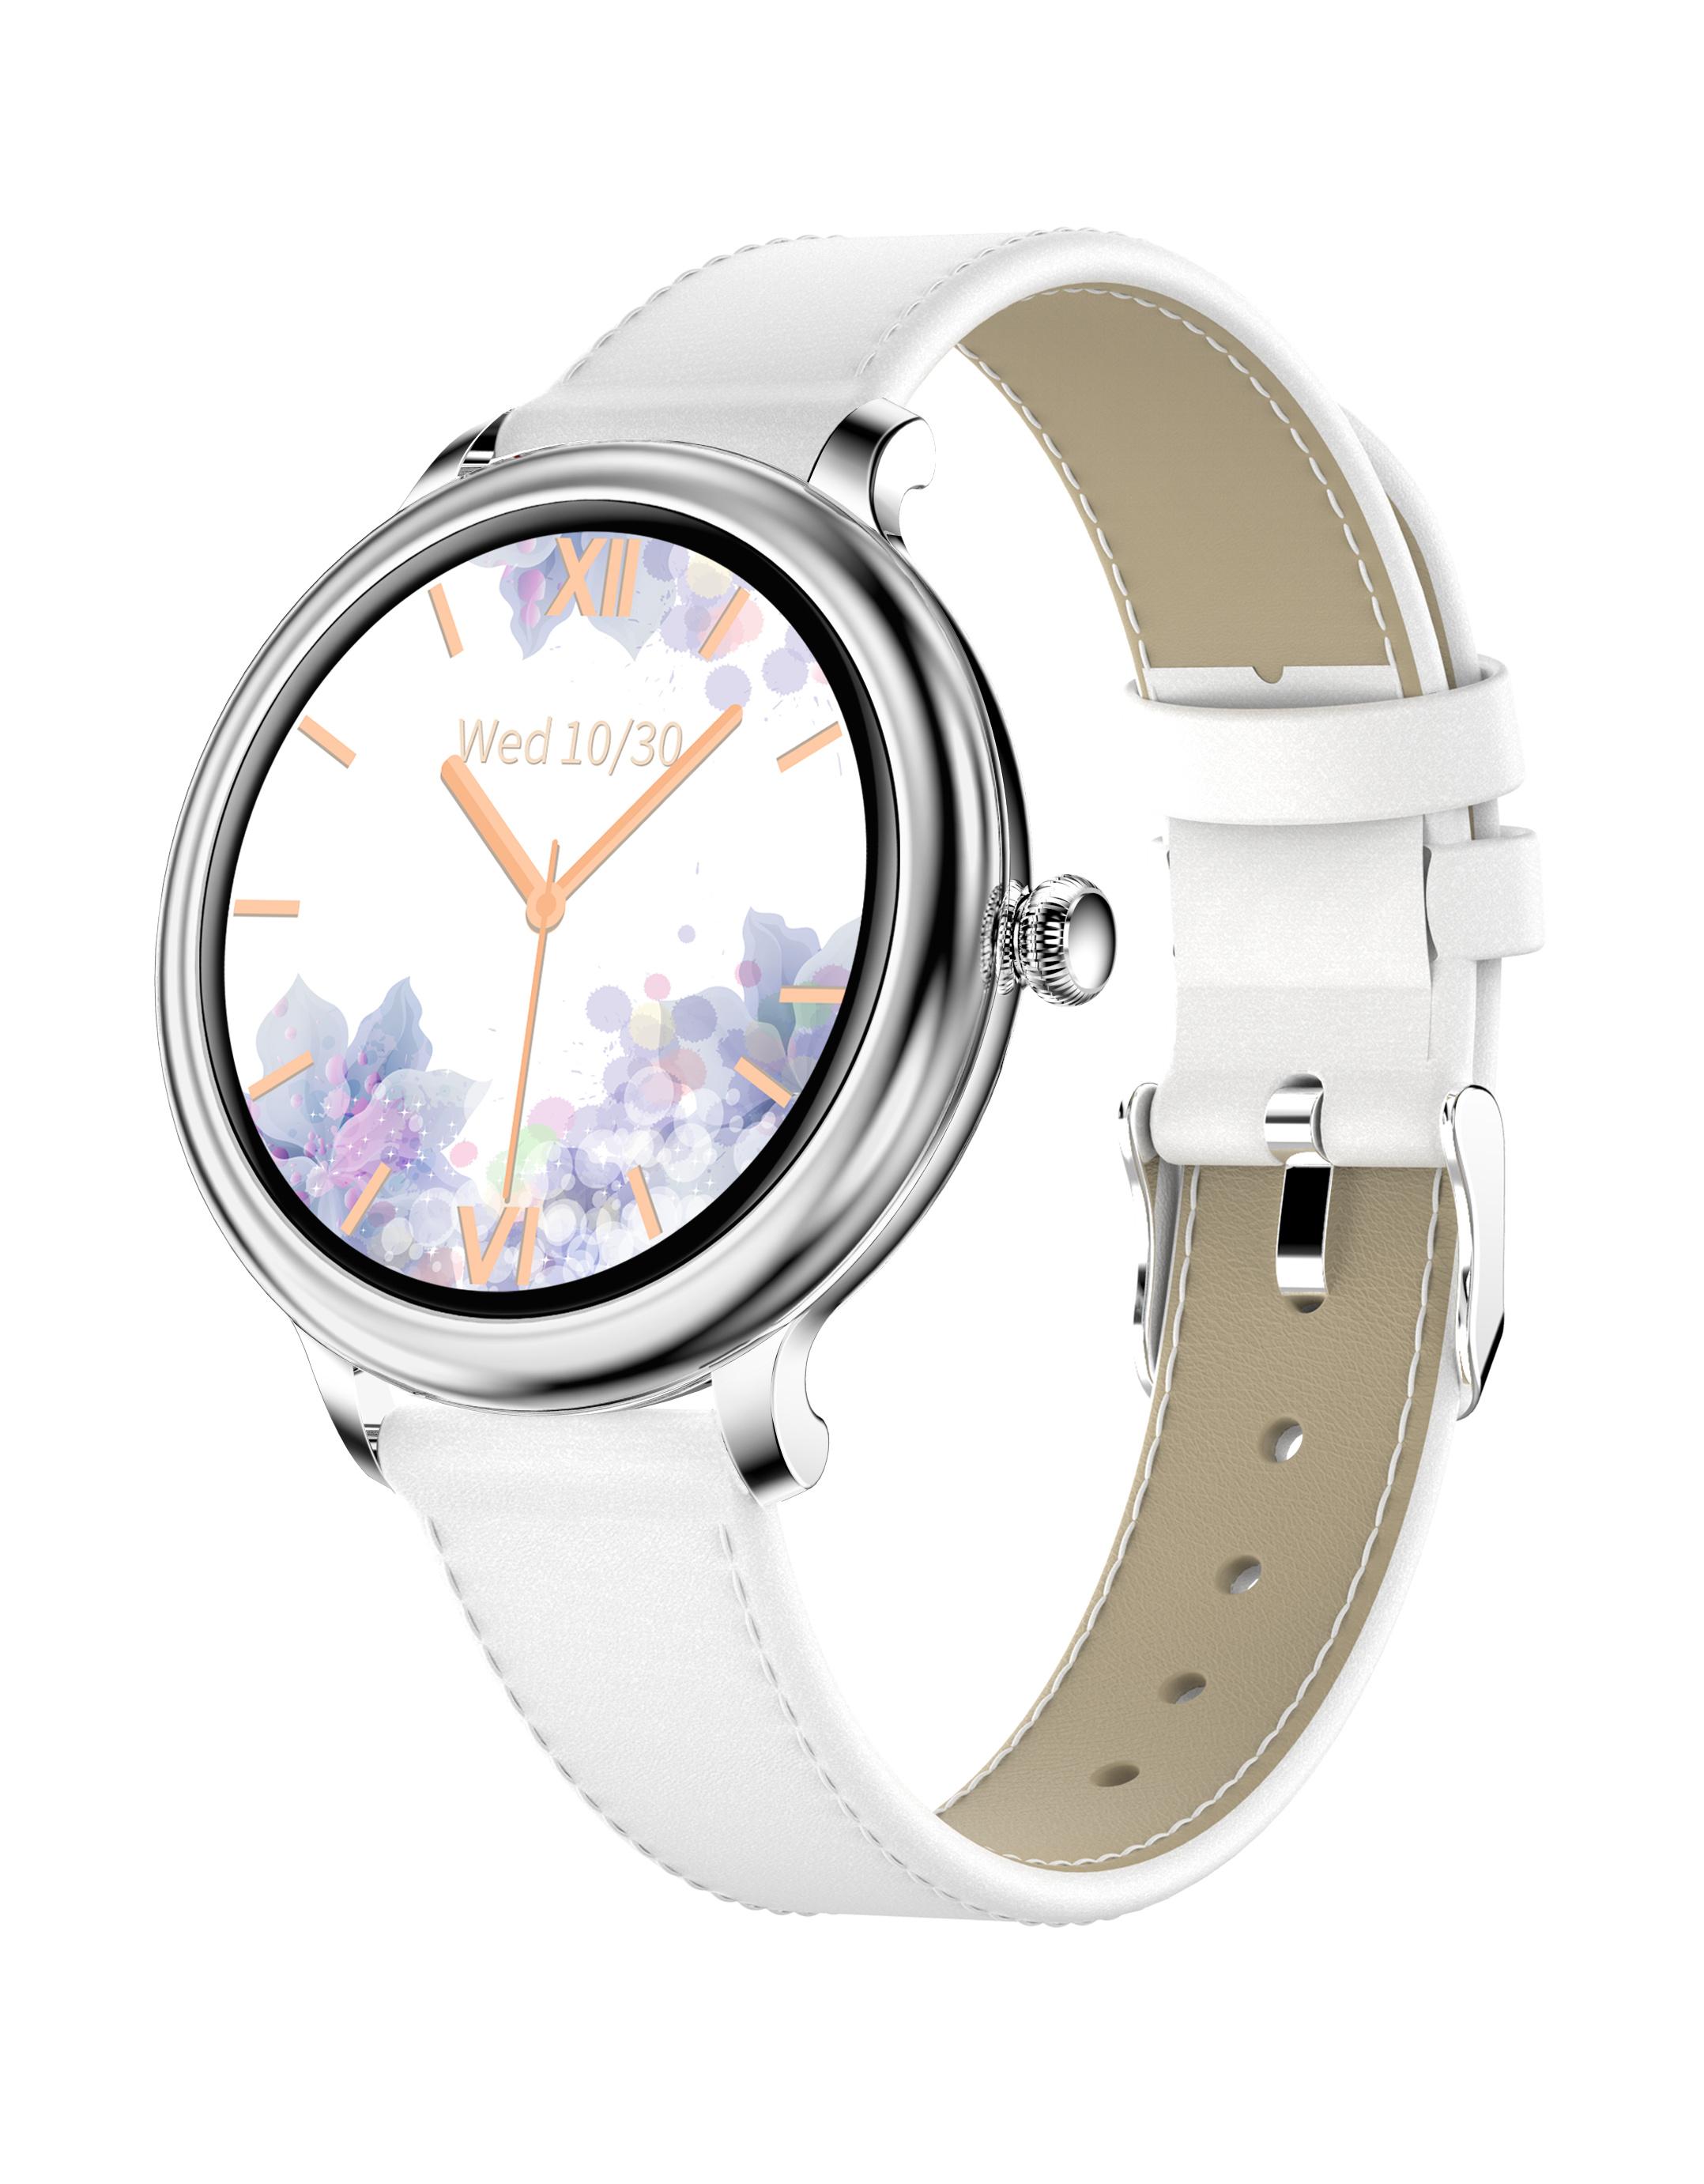 Ny13 Smart Watch Lady Heart Rate Blood Pressure Monitor Ip68 Waterproof 2.5d Lcd Screen Smartwatch Leather Belt silver